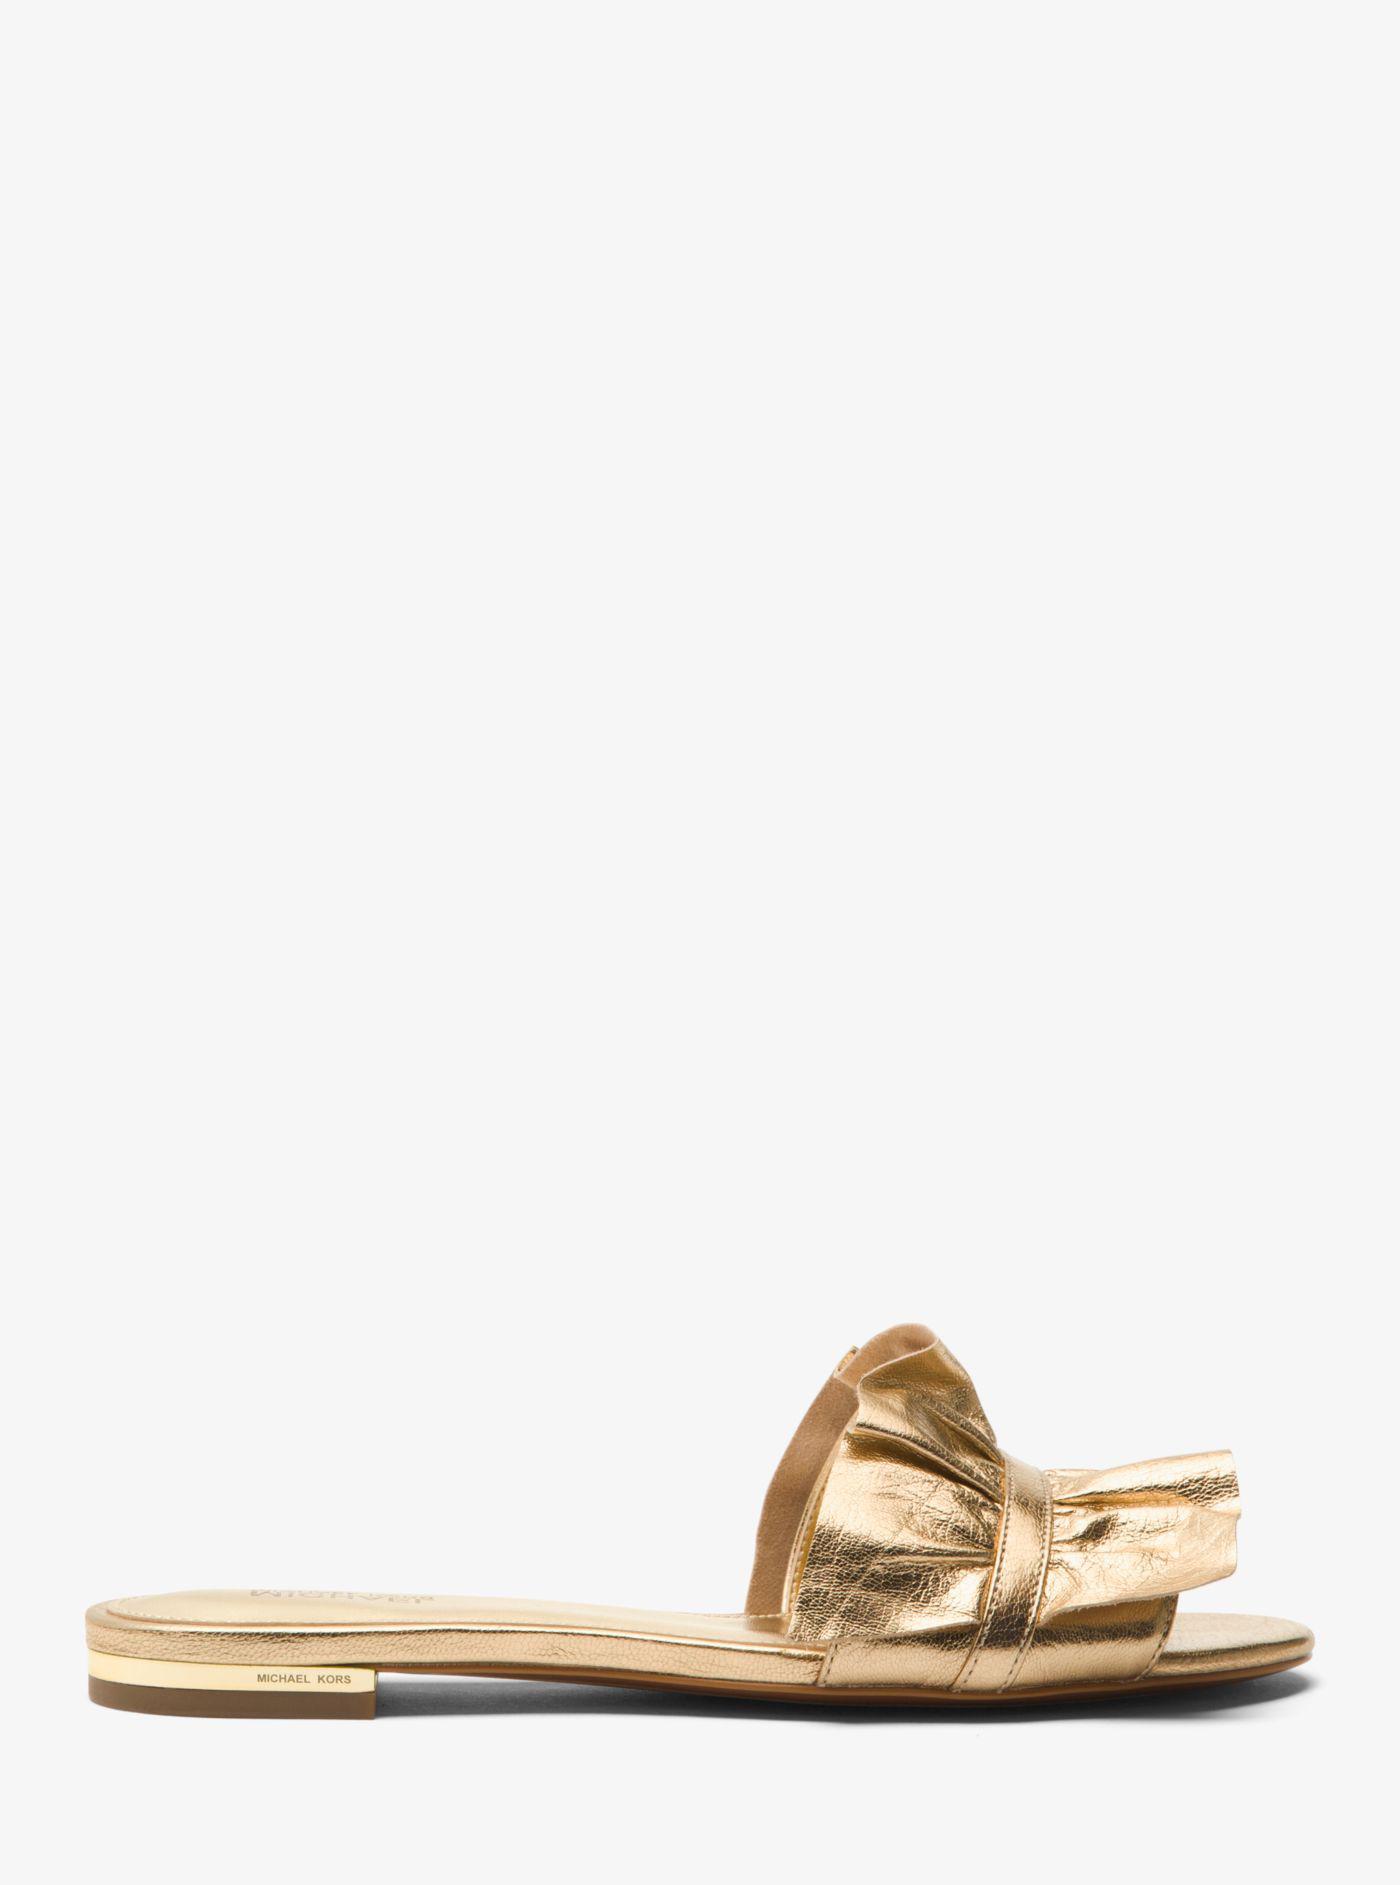 e262e978a062 Lyst - Michael Kors Bella Ruffled Metallic Leather Slide in Metallic